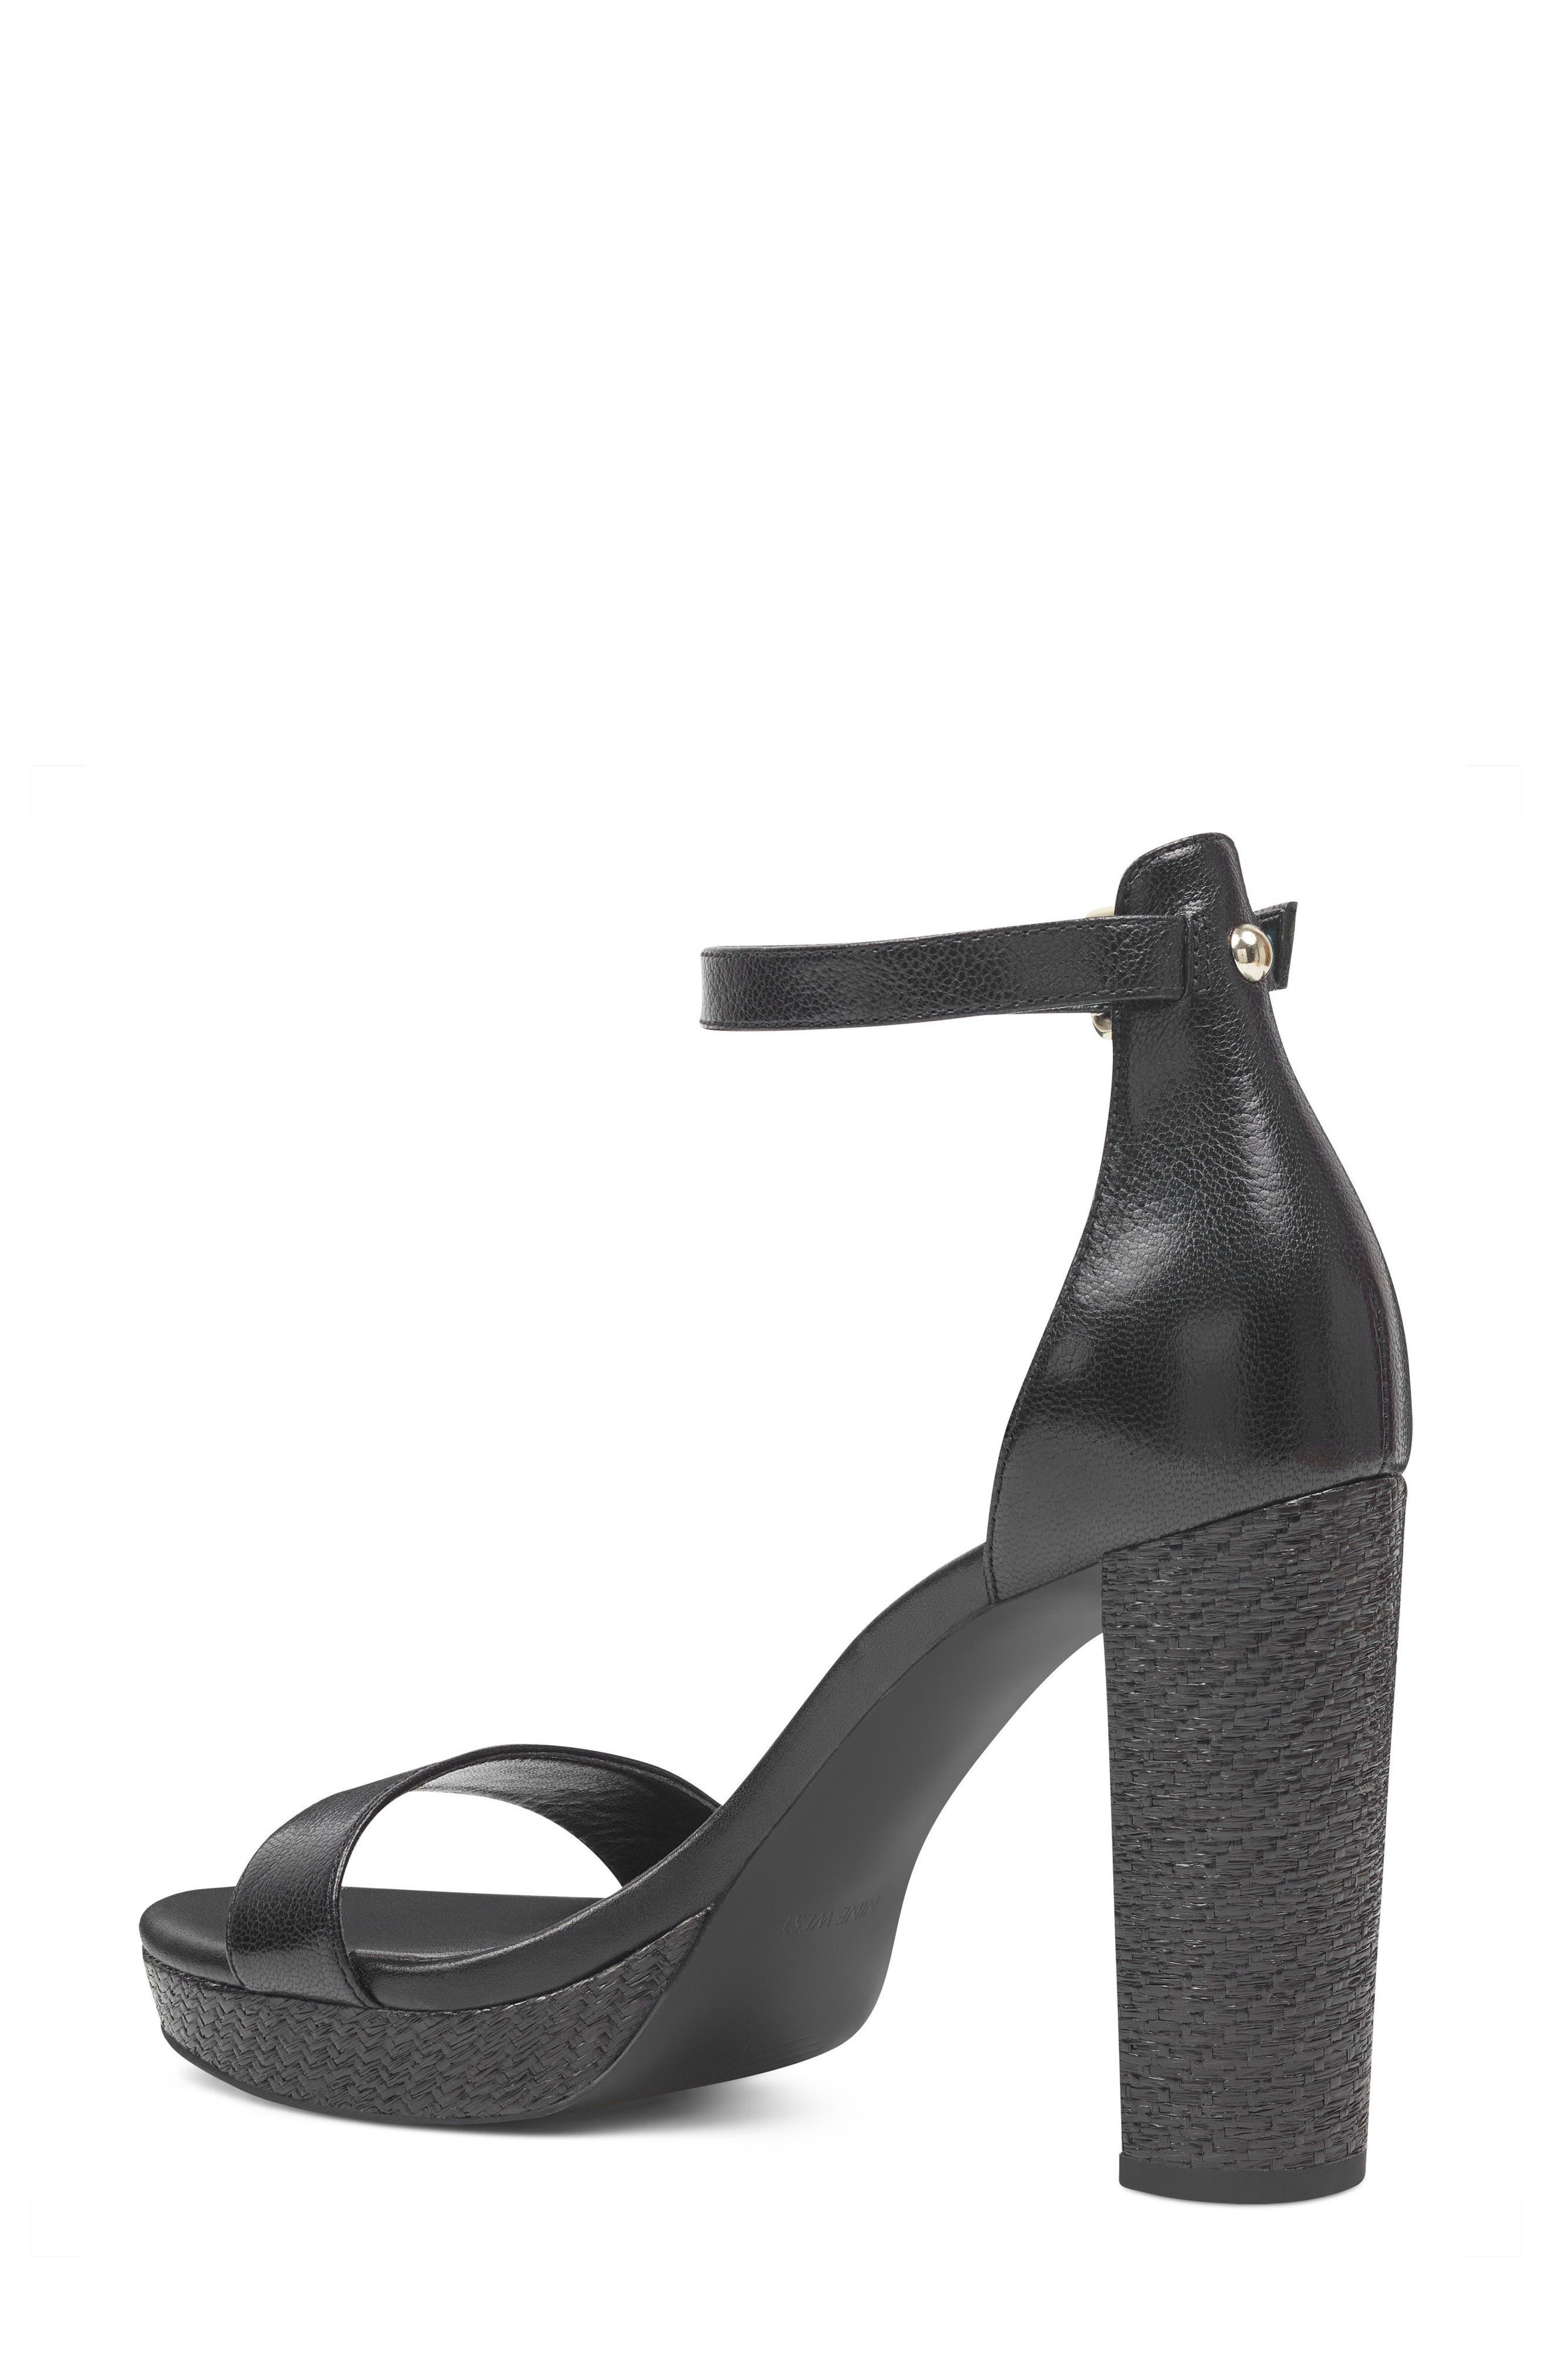 Dempsey Platform Sandal,                             Alternate thumbnail 2, color,                             Black